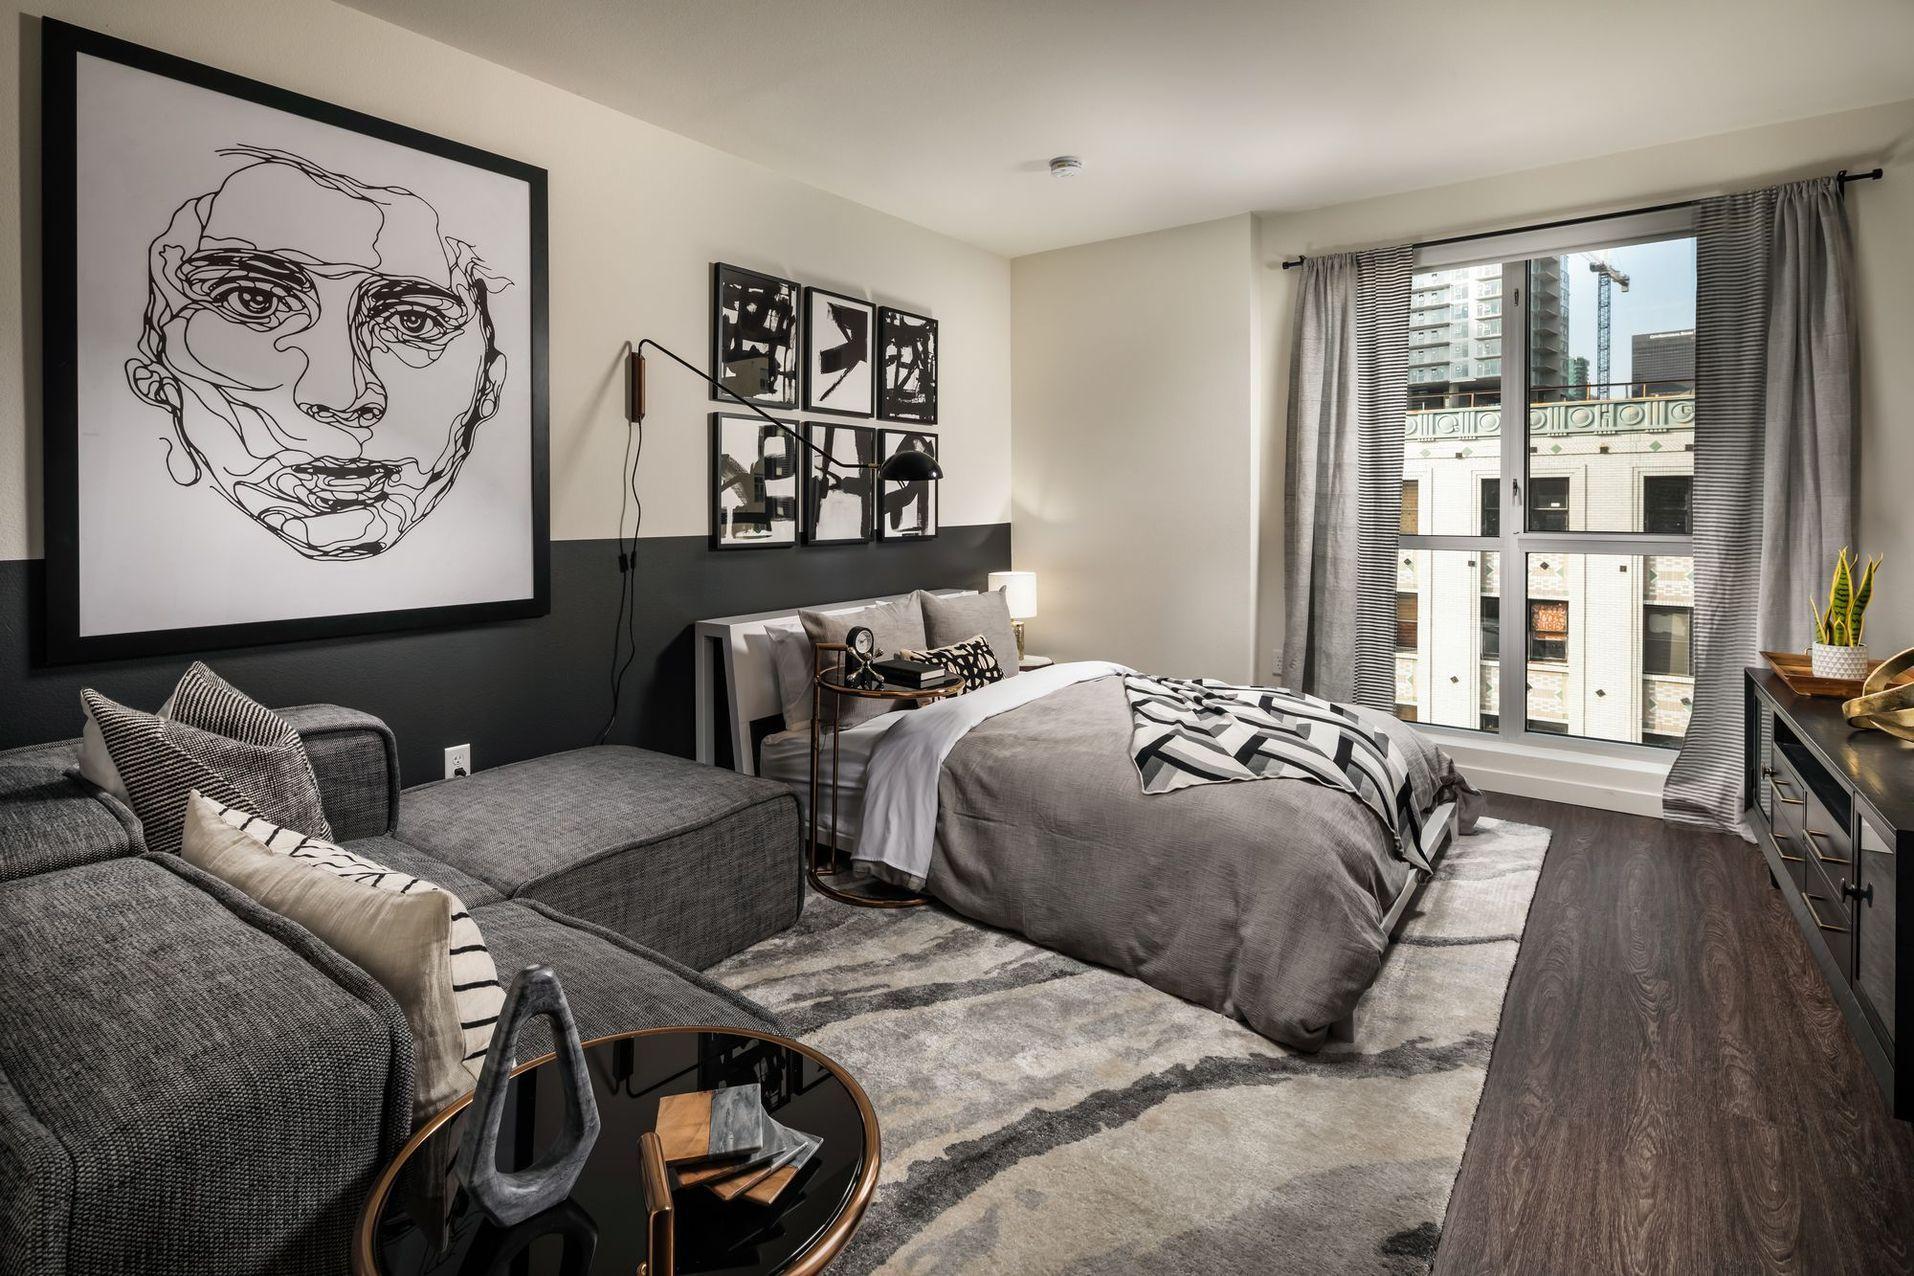 DTLA Luxury Apartments Onyx Photo Gallery New york